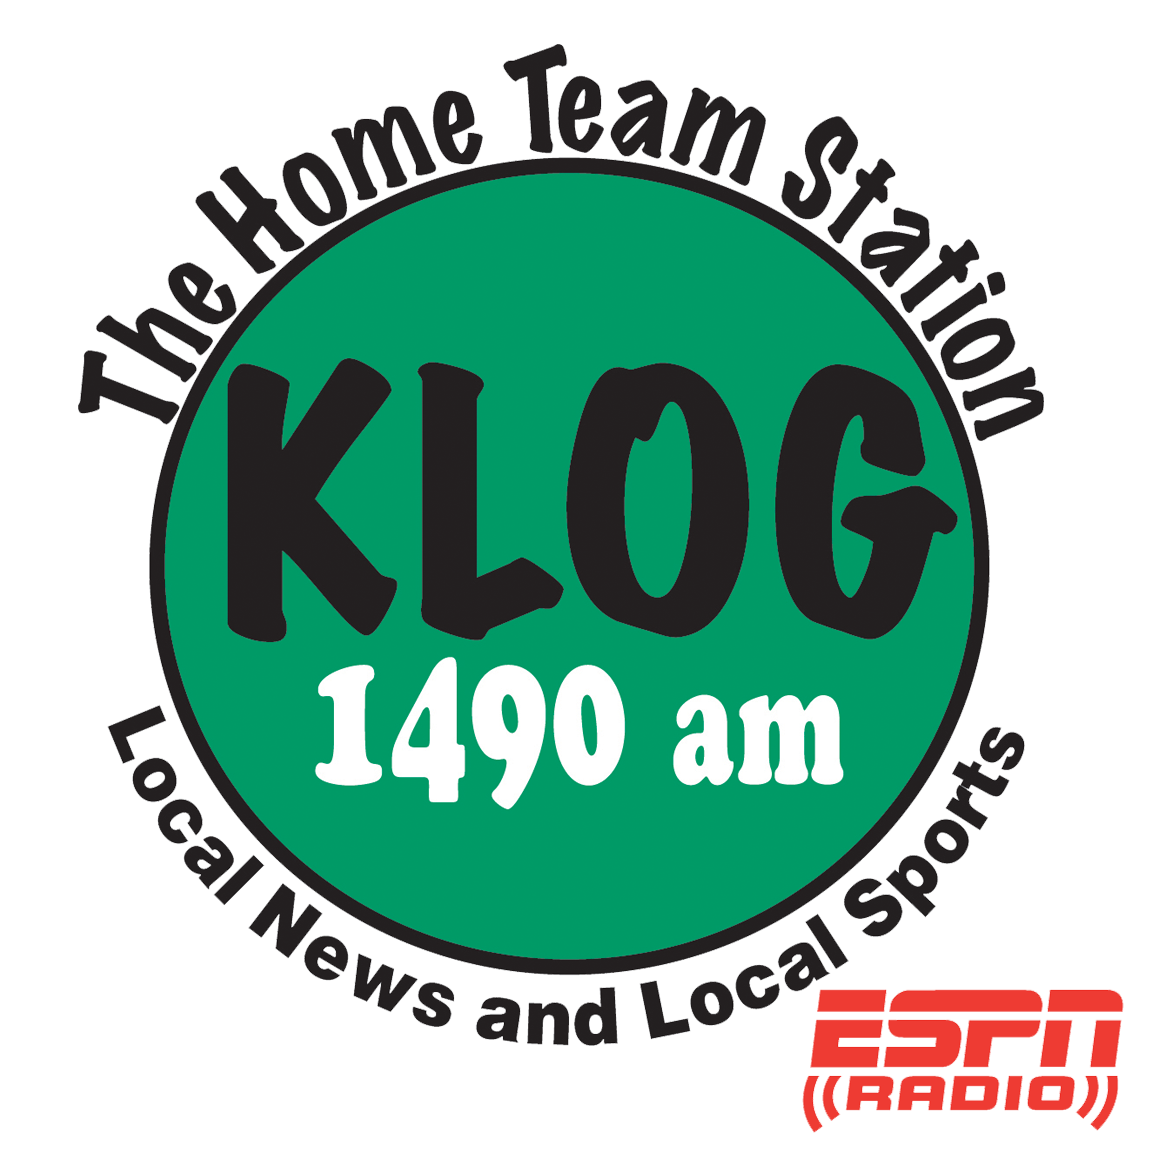 KLOG The Home Team Station